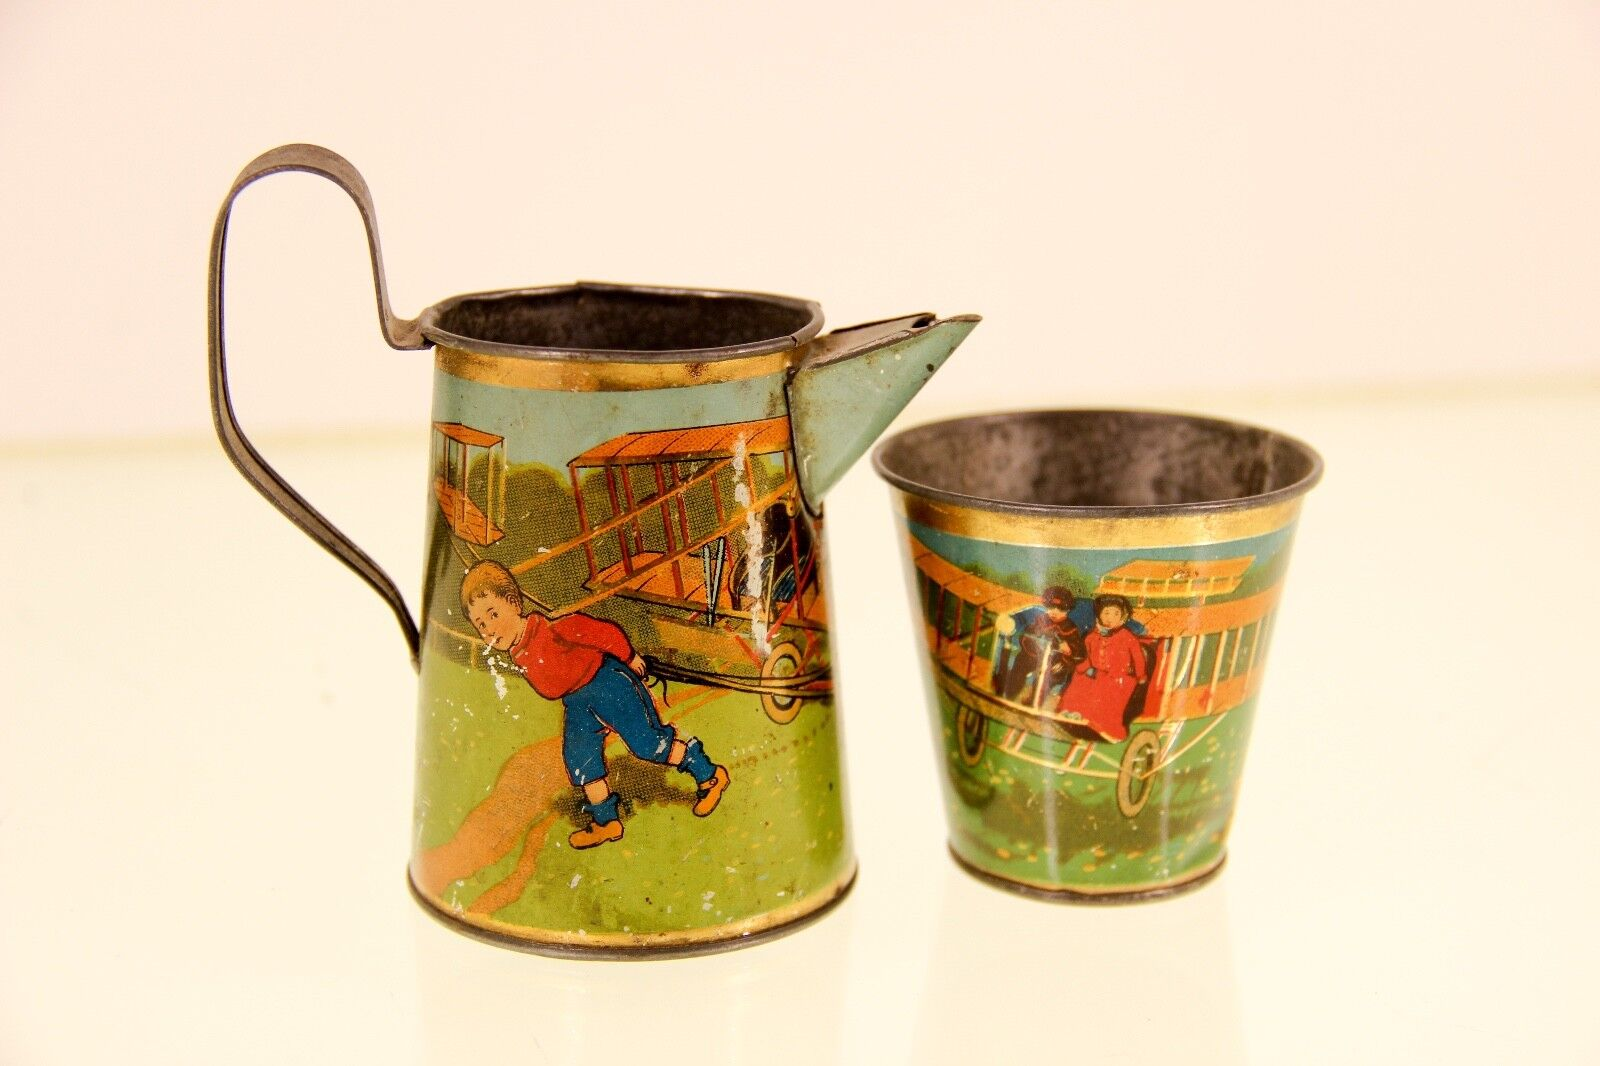 Juguetes infantiles raros de estaño, jarras de agua, impresoras de piedra, utensilios de té